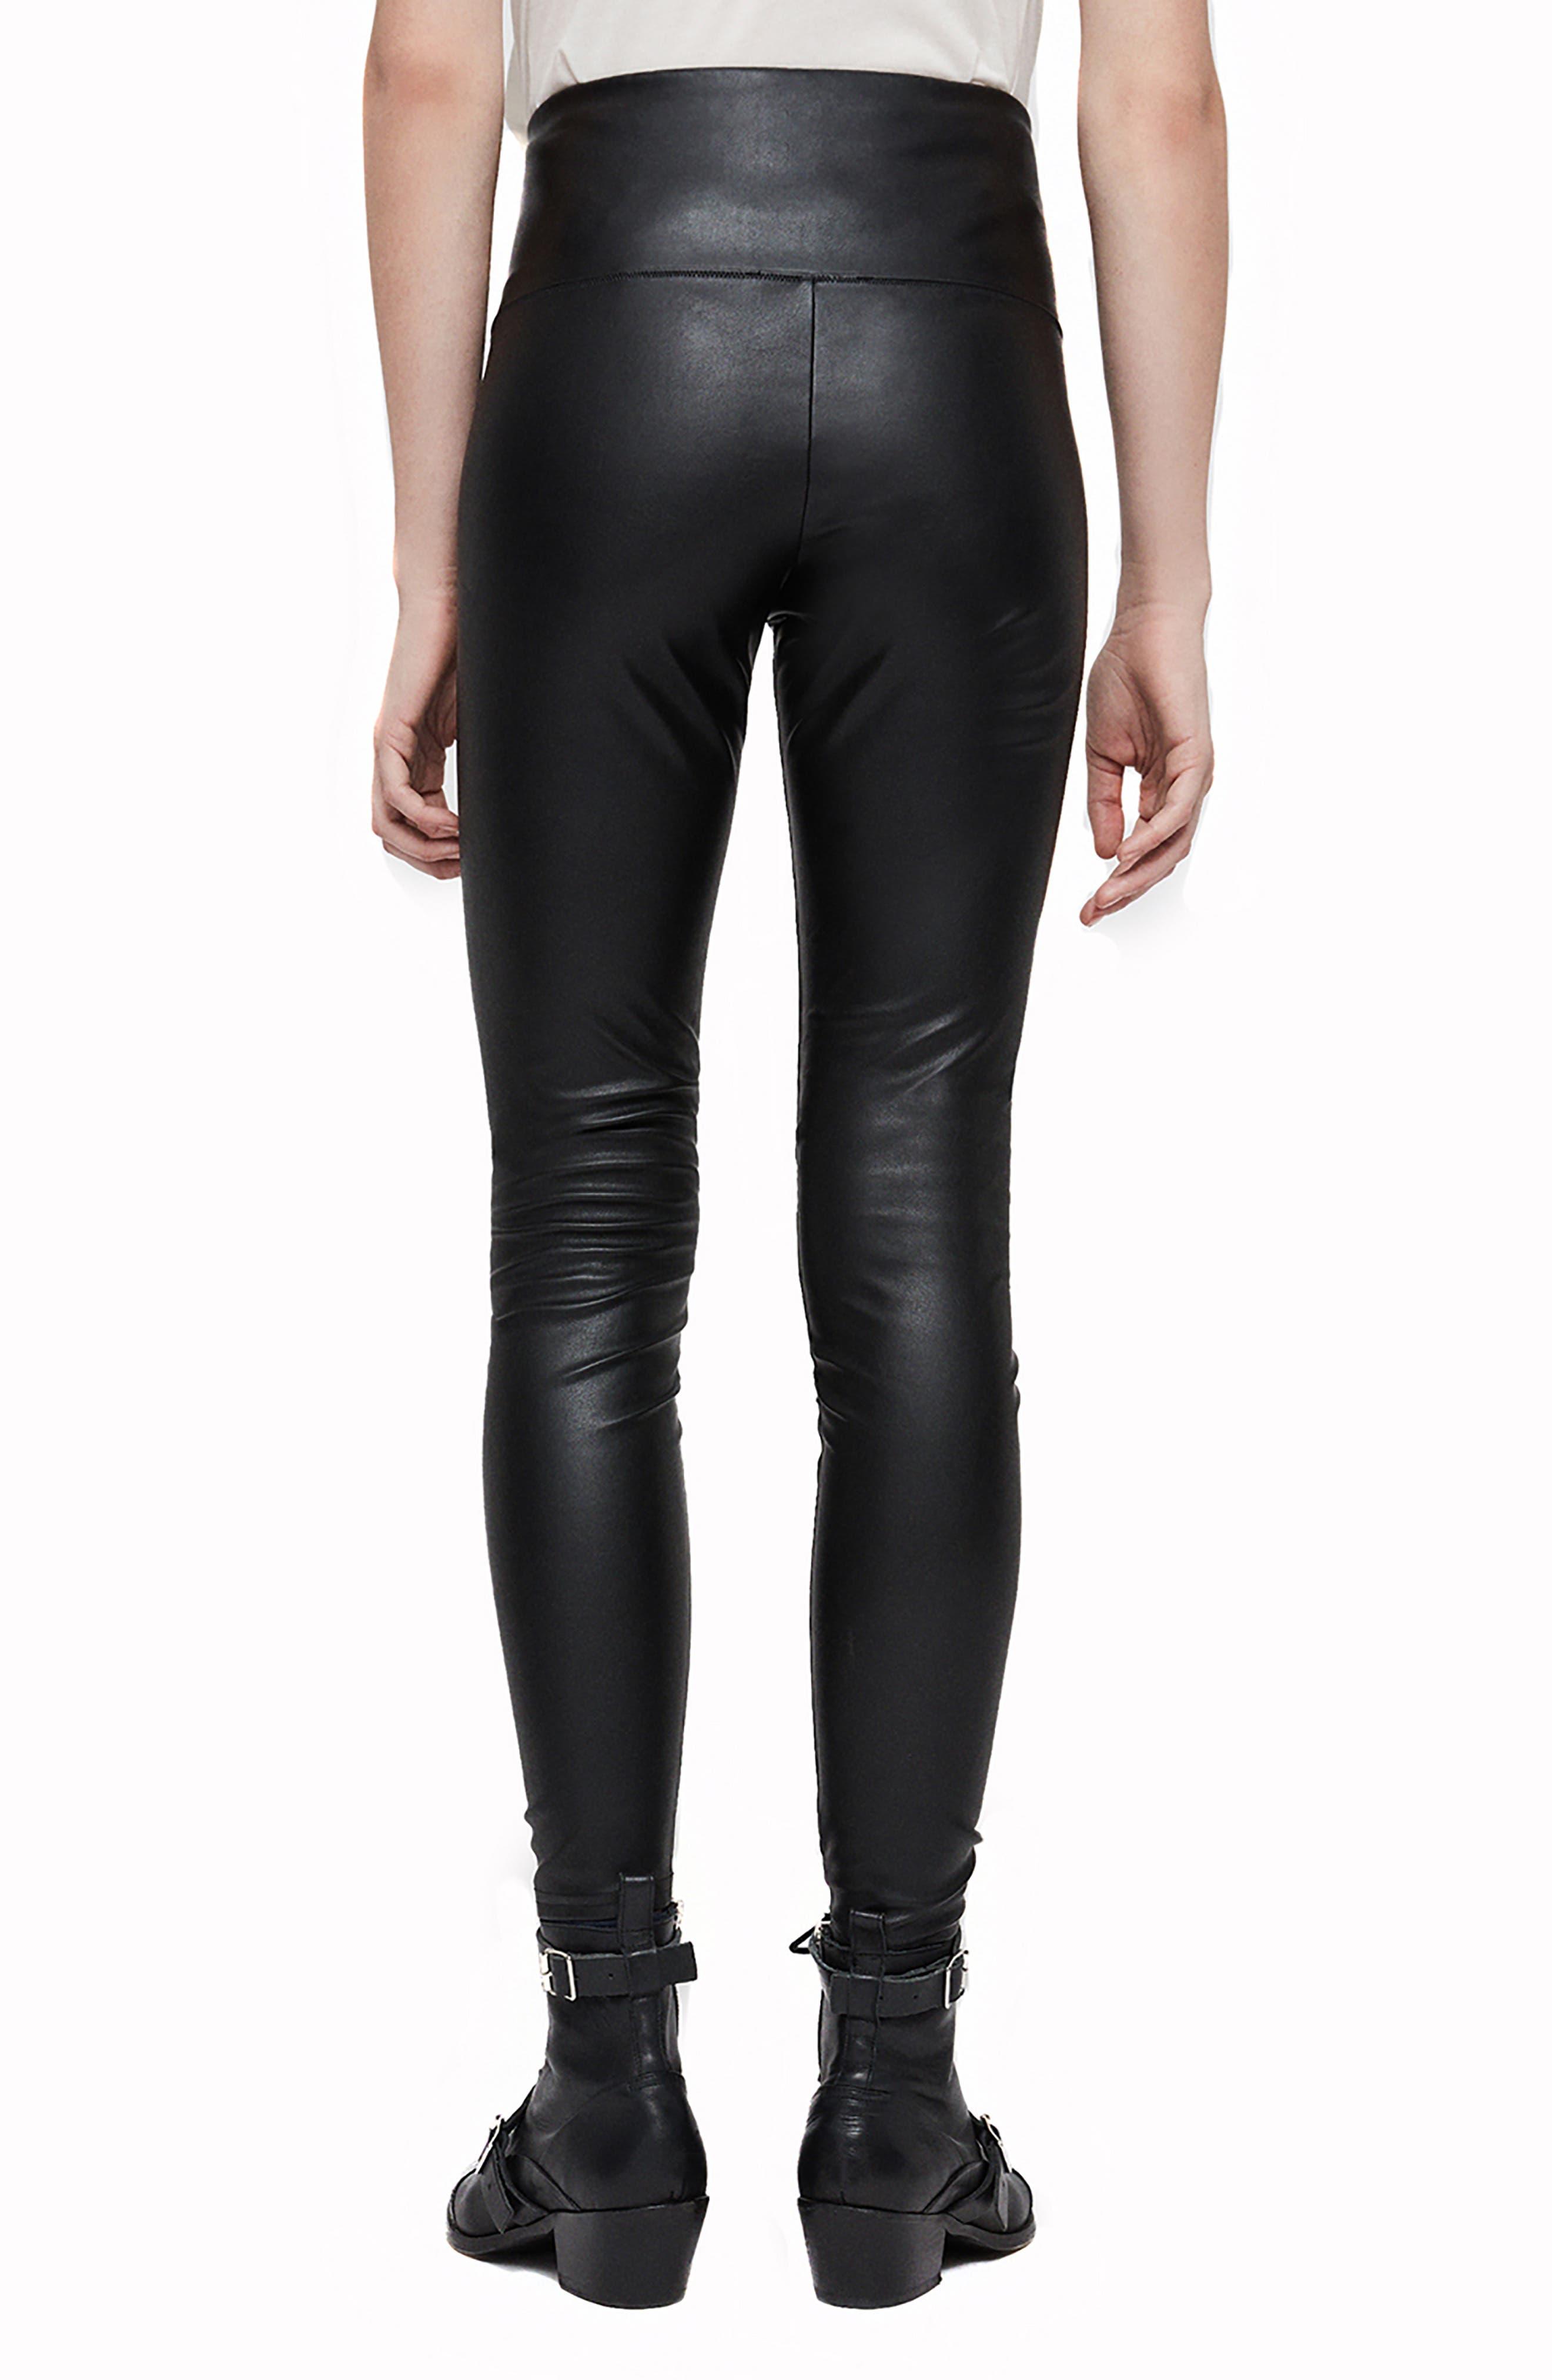 Cora Faux Leather Leggings,                             Alternate thumbnail 2, color,                             BLACK